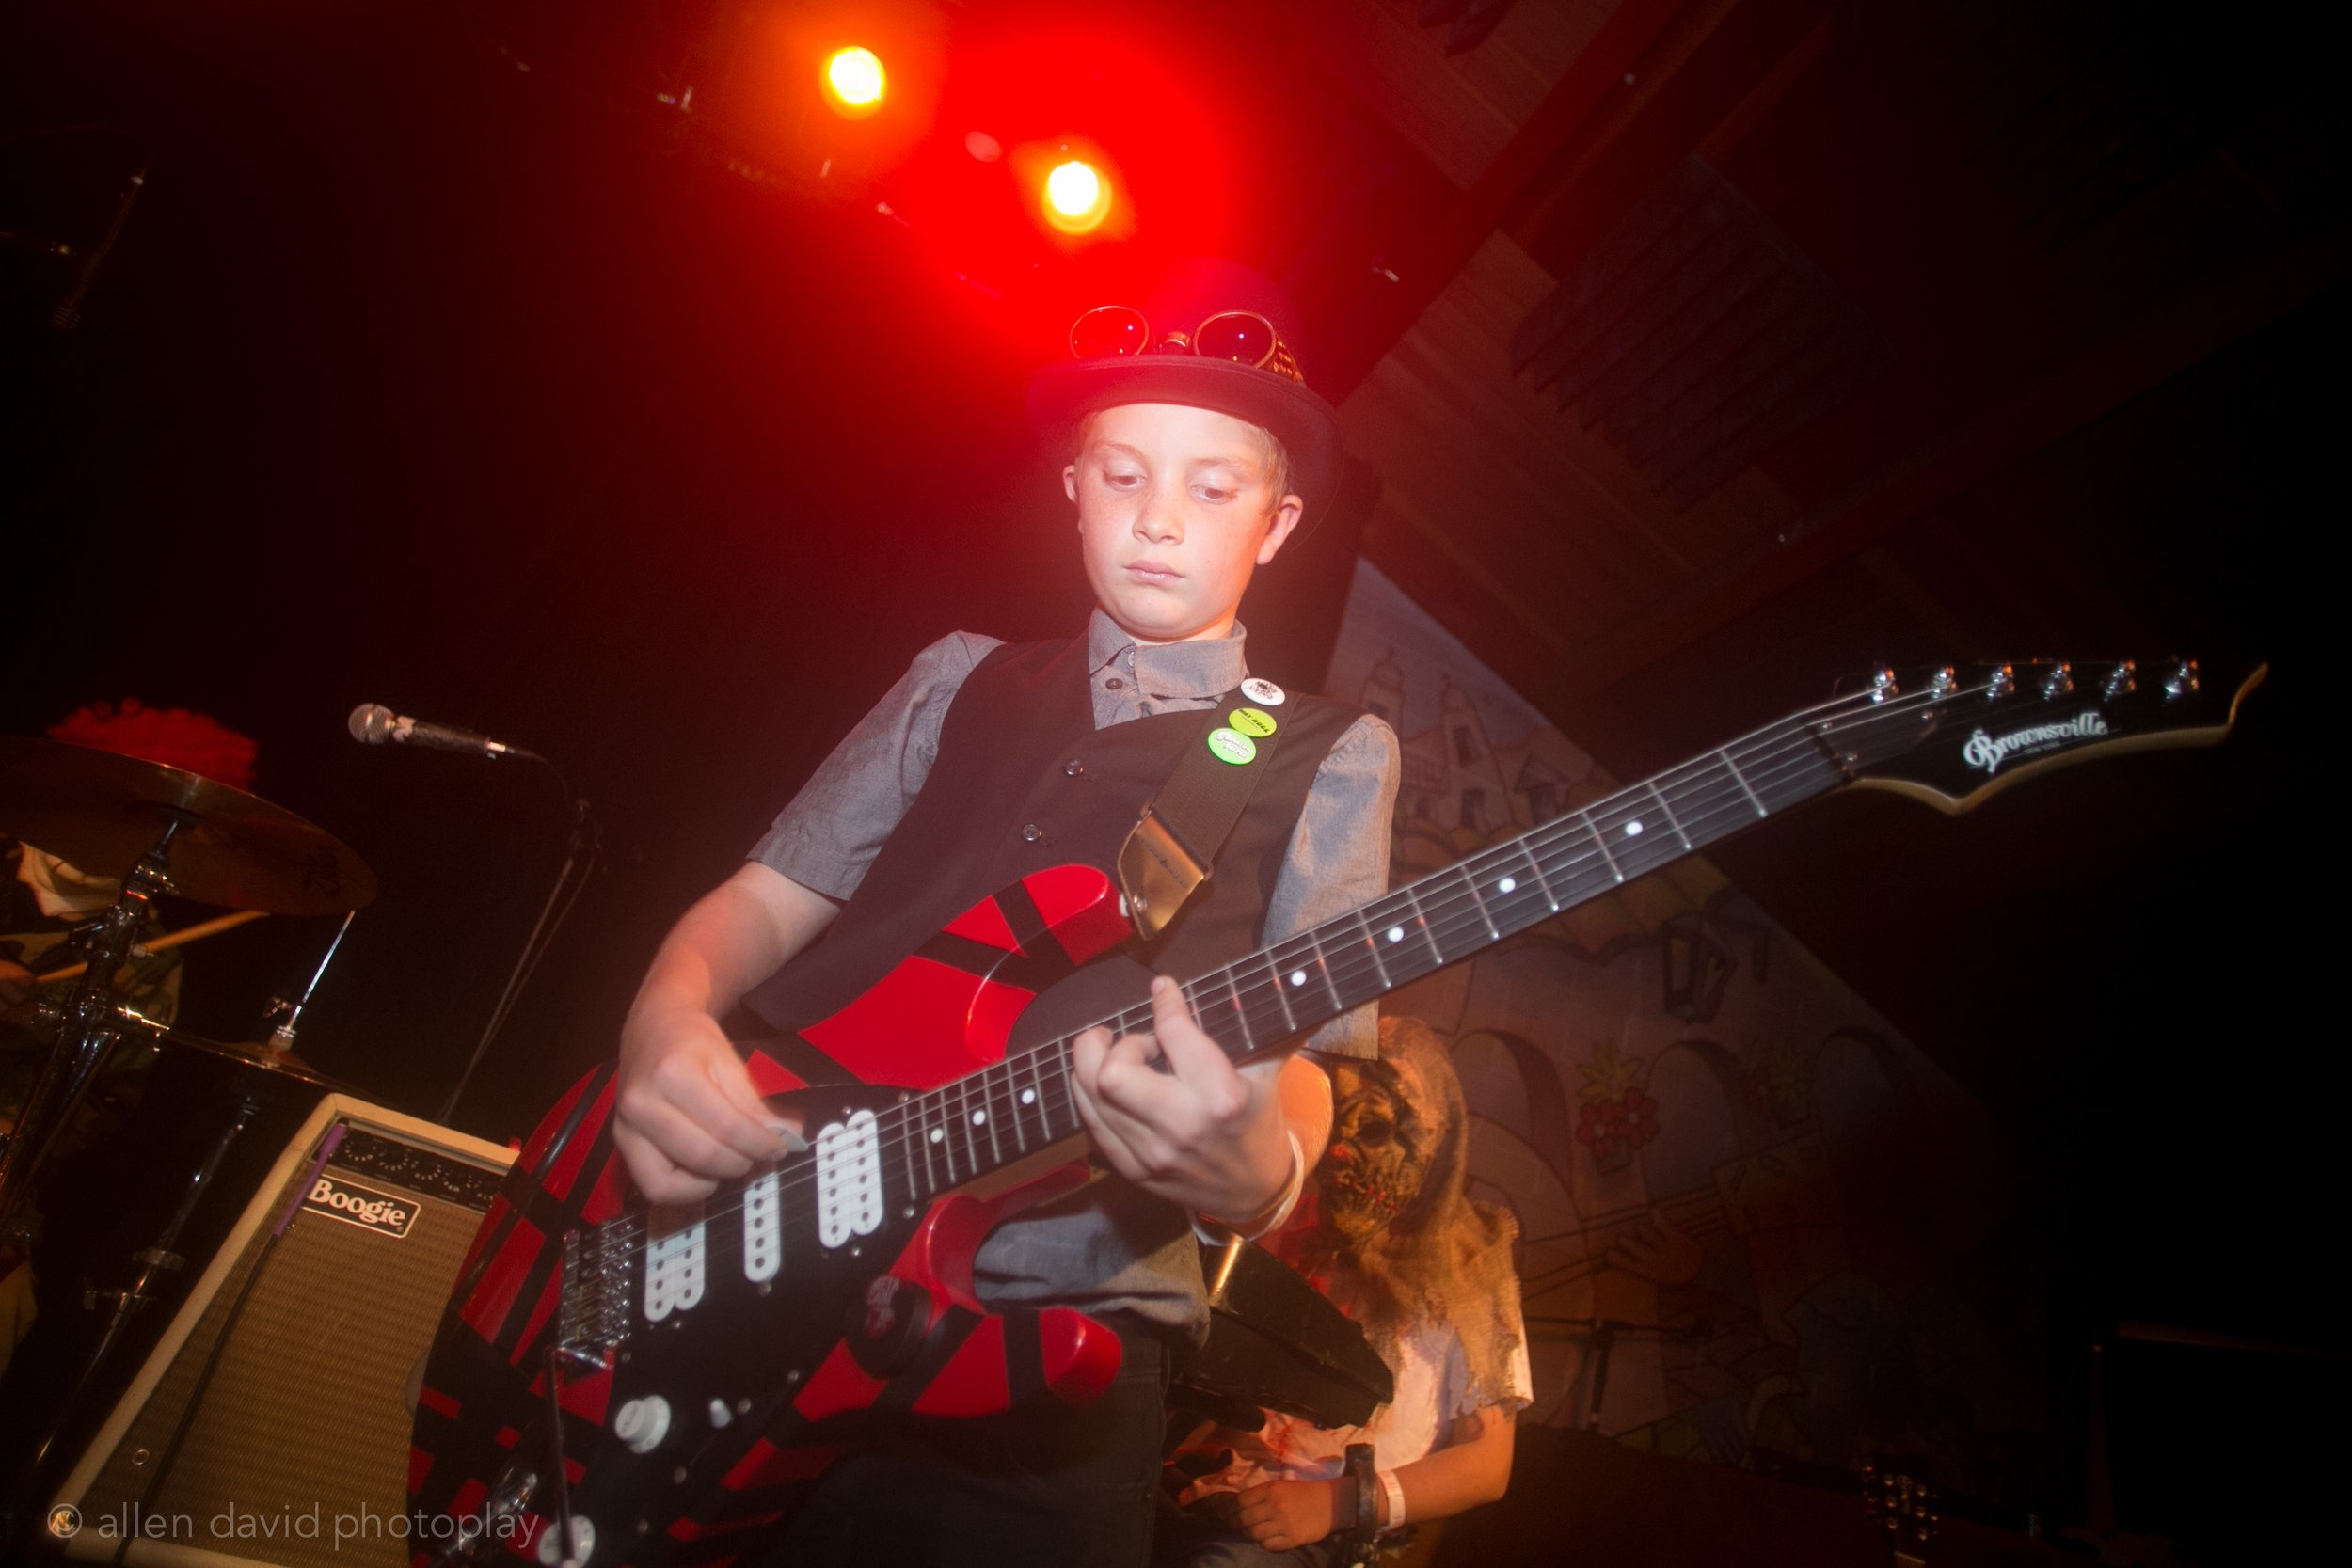 Thure rocks the guitar!